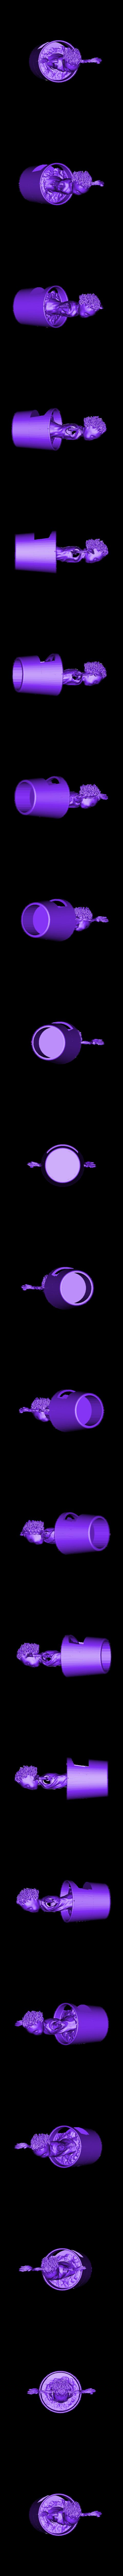 groot_complete_assembly.stl Download free STL file SOLAR dancing GROOT • 3D printable design, atarka3